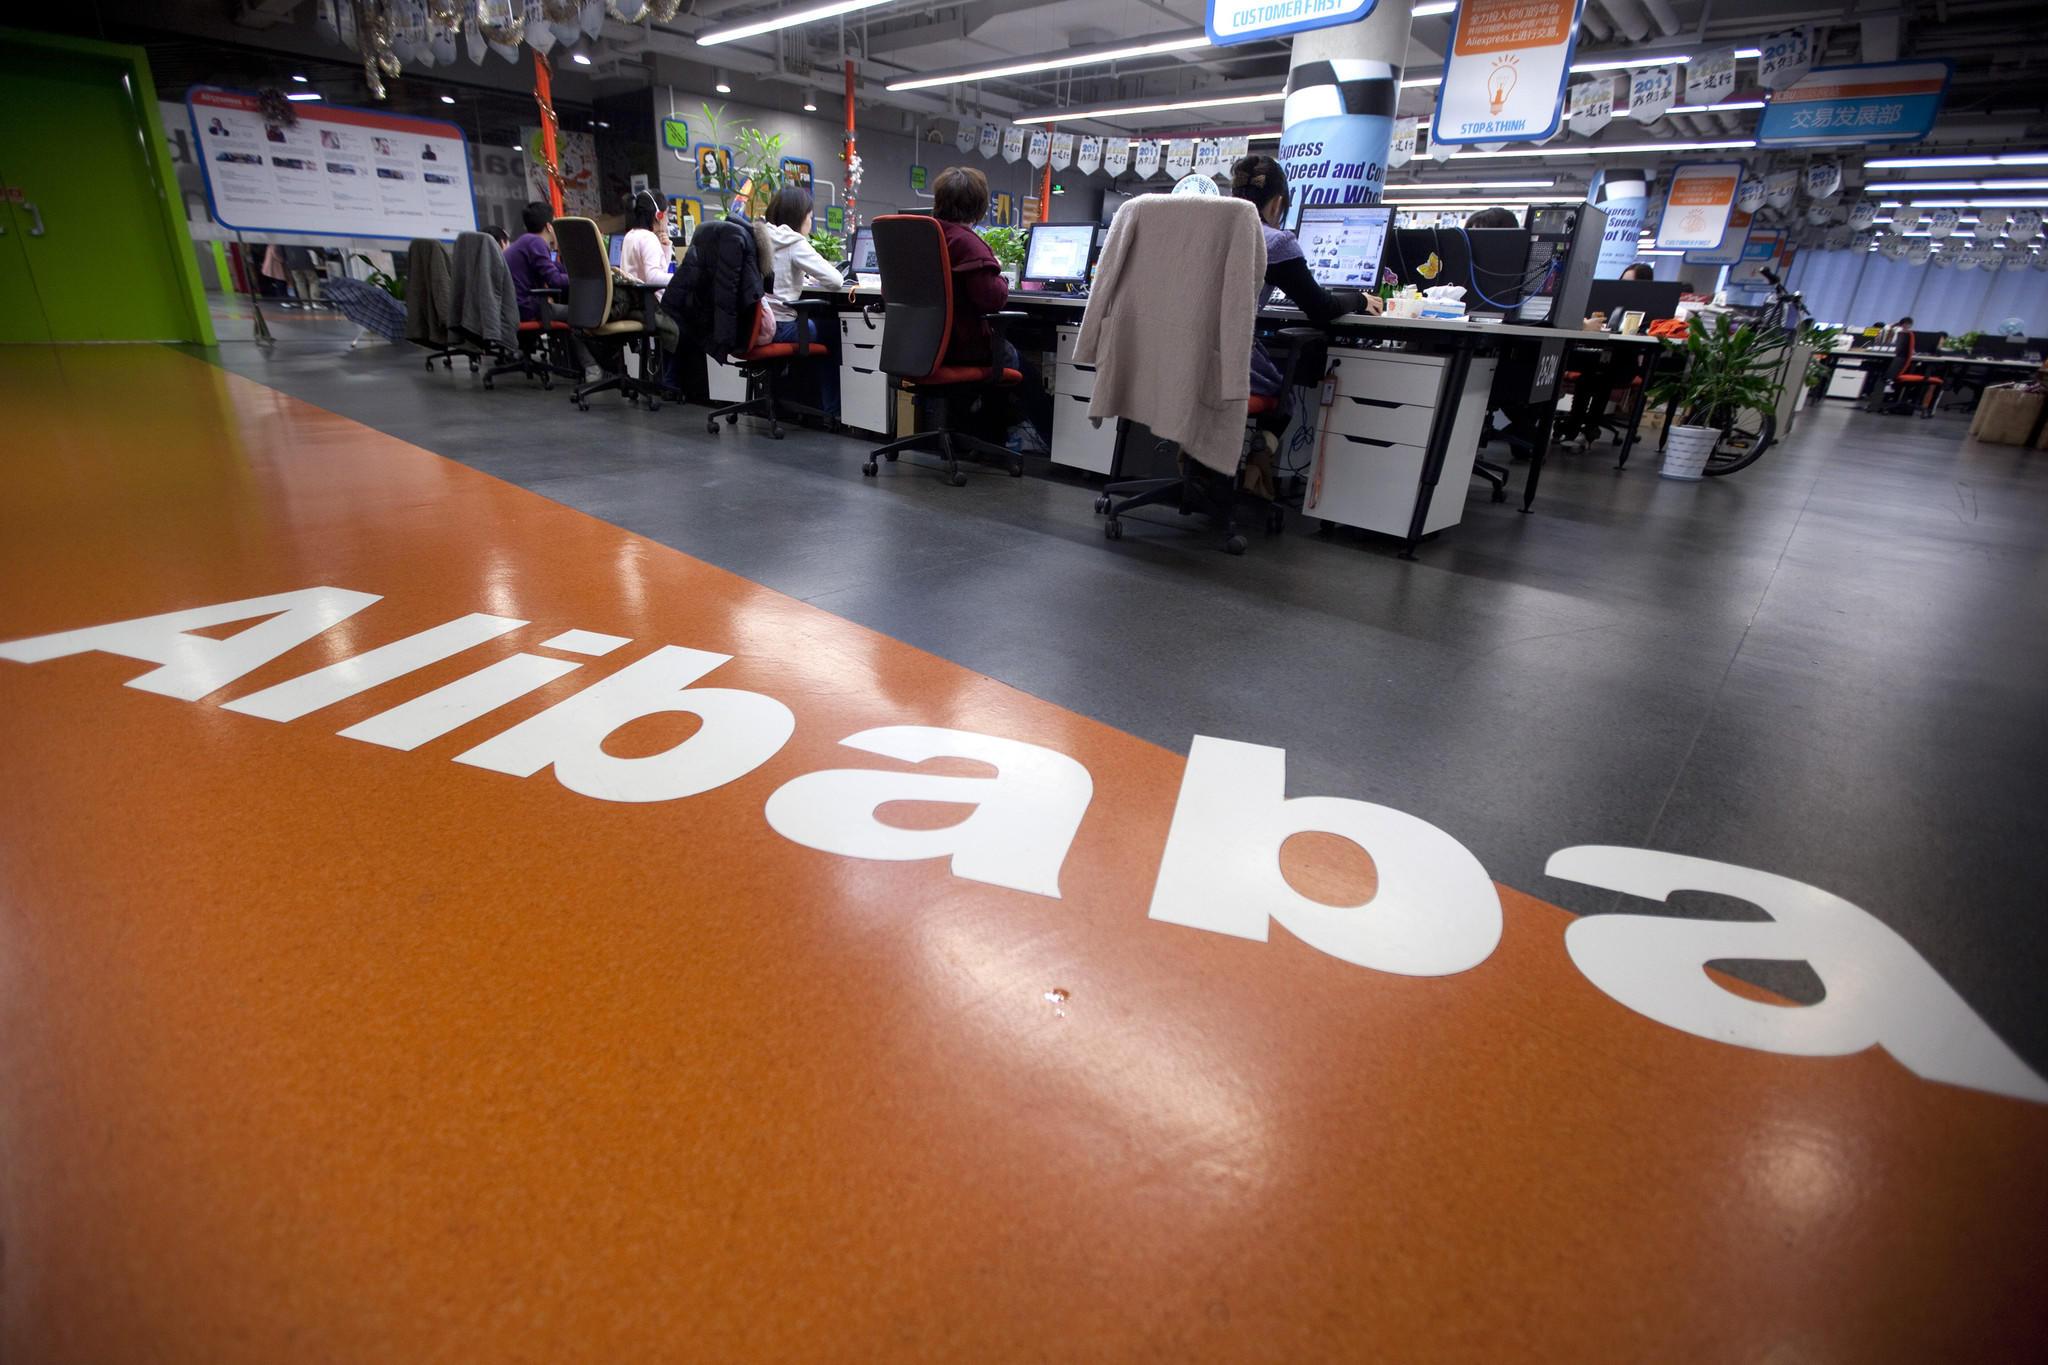 Employees work at Alibaba.com Ltd.'s headquarters in Hangzhou, China.